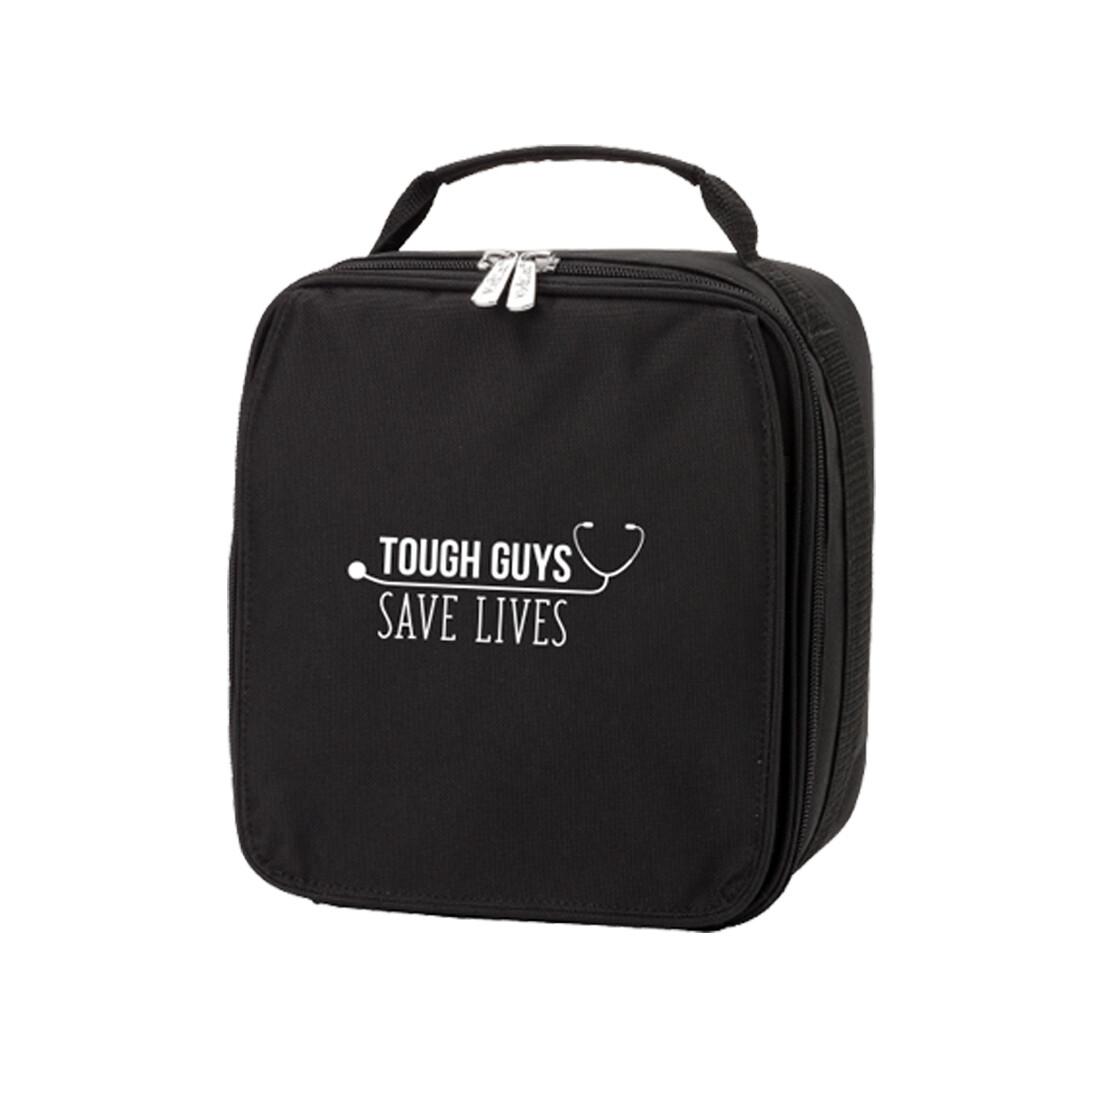 Tough Guys Save Lives Black Lunch Bag